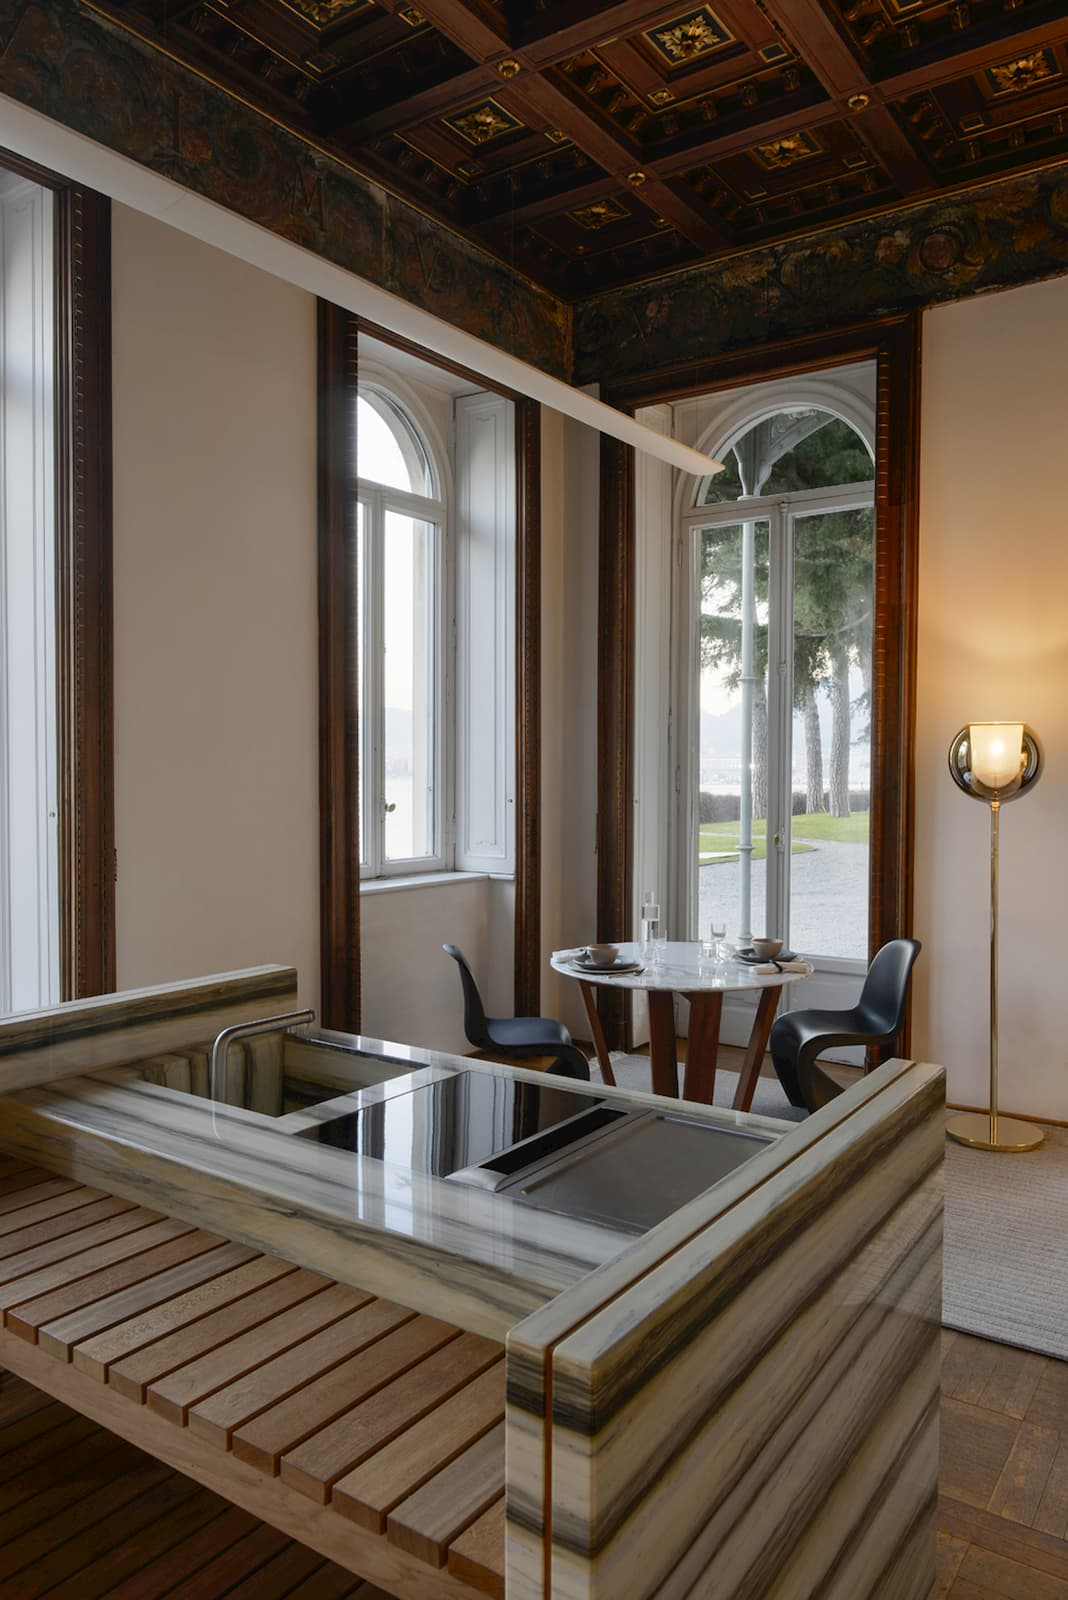 Intnow - marble design - Zerbino fireplace